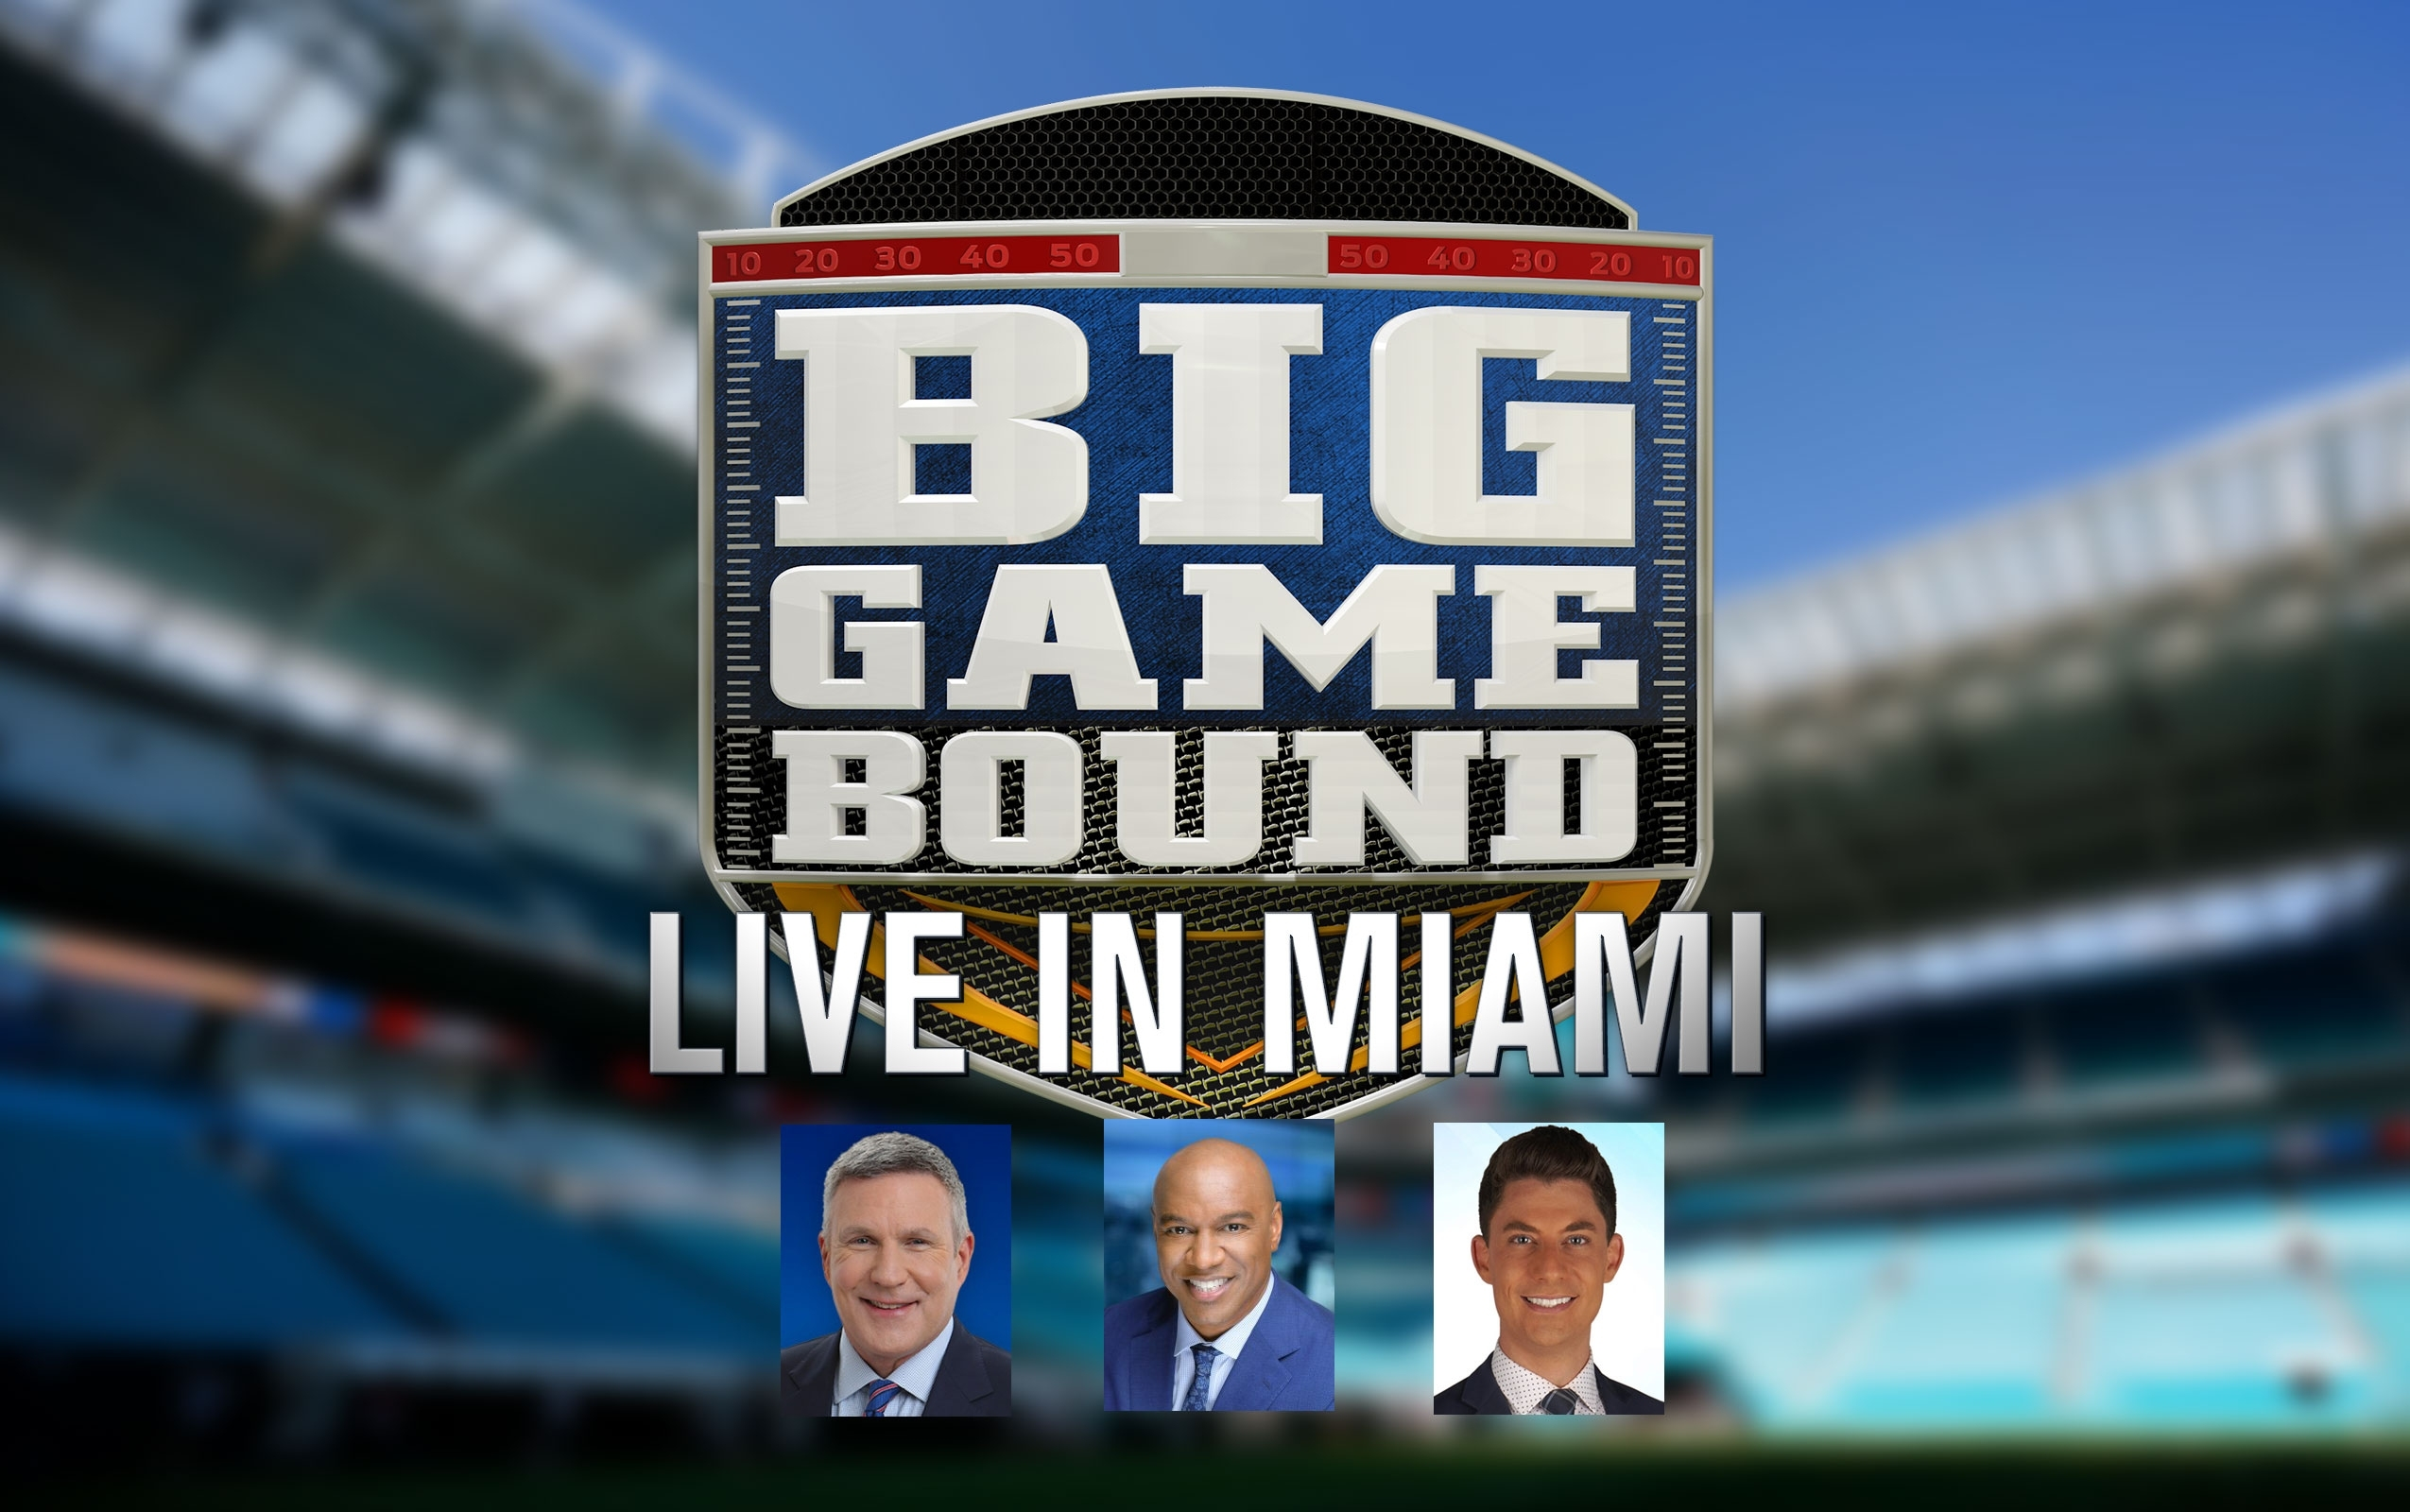 Big Game Bound' To Stream Daily From Super Bowl In Miami regarding Super Bowl Radio Broadcast Miami